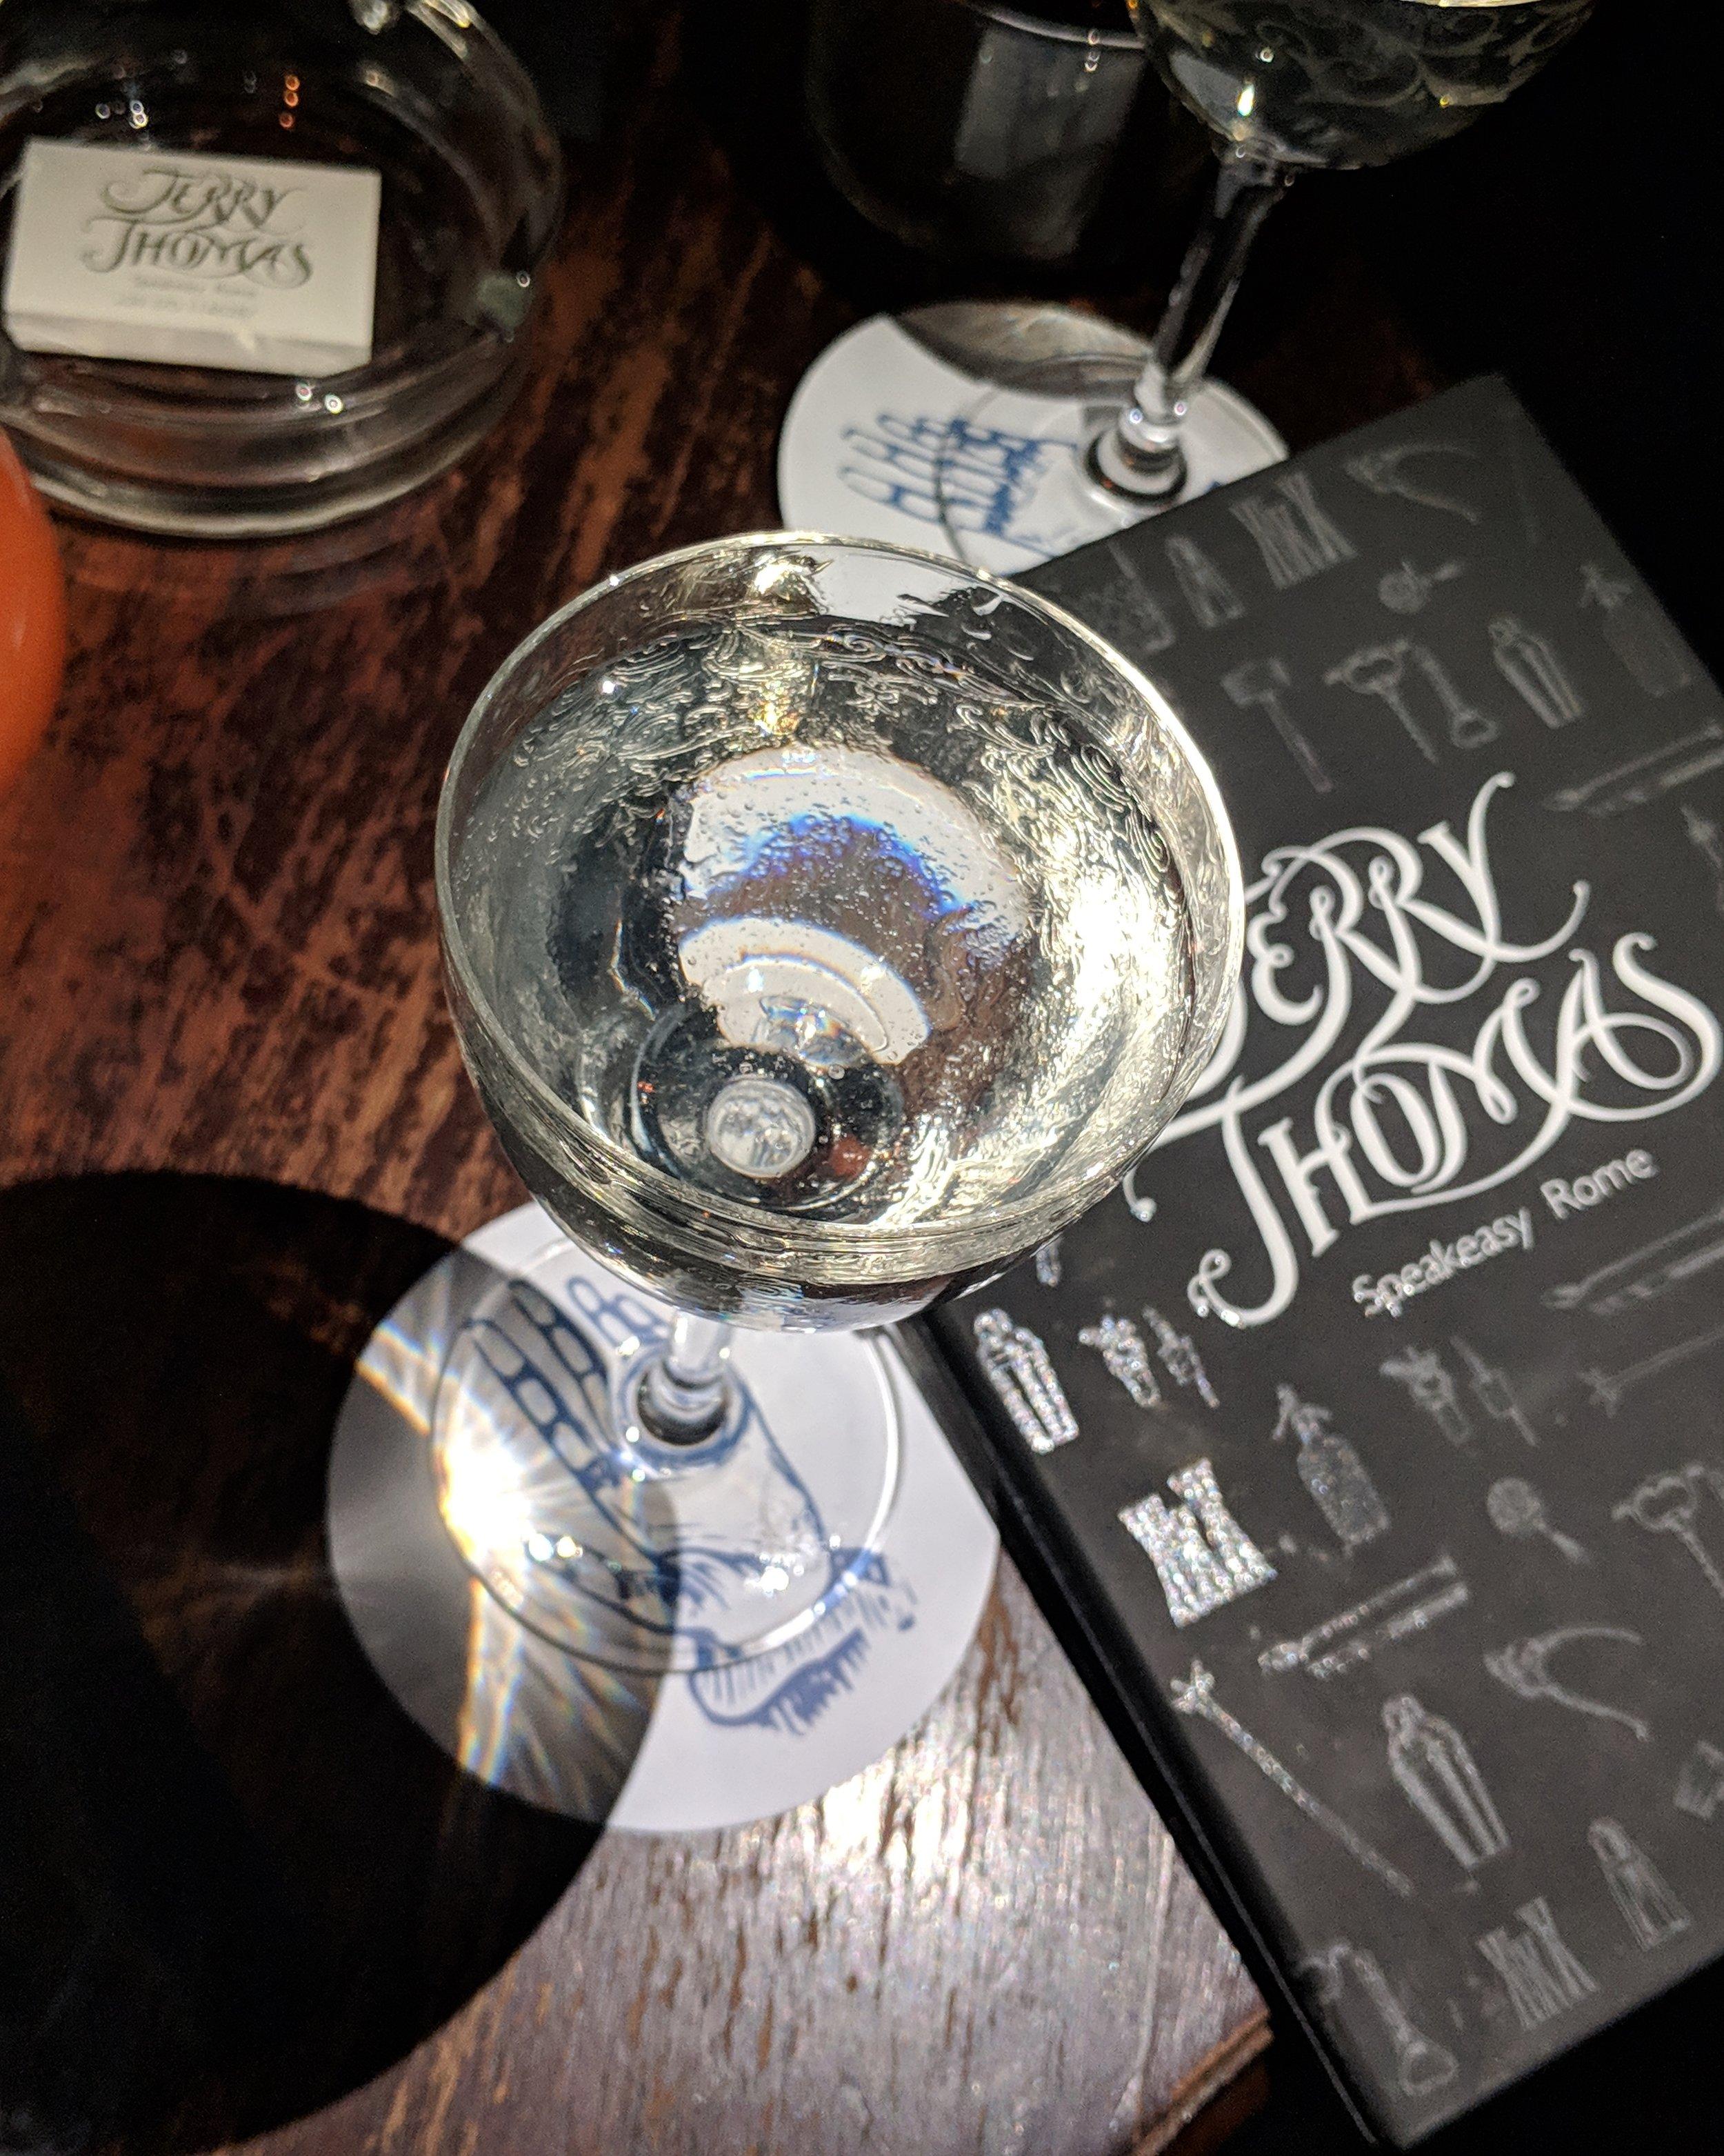 House Martini at Jerry Thomas